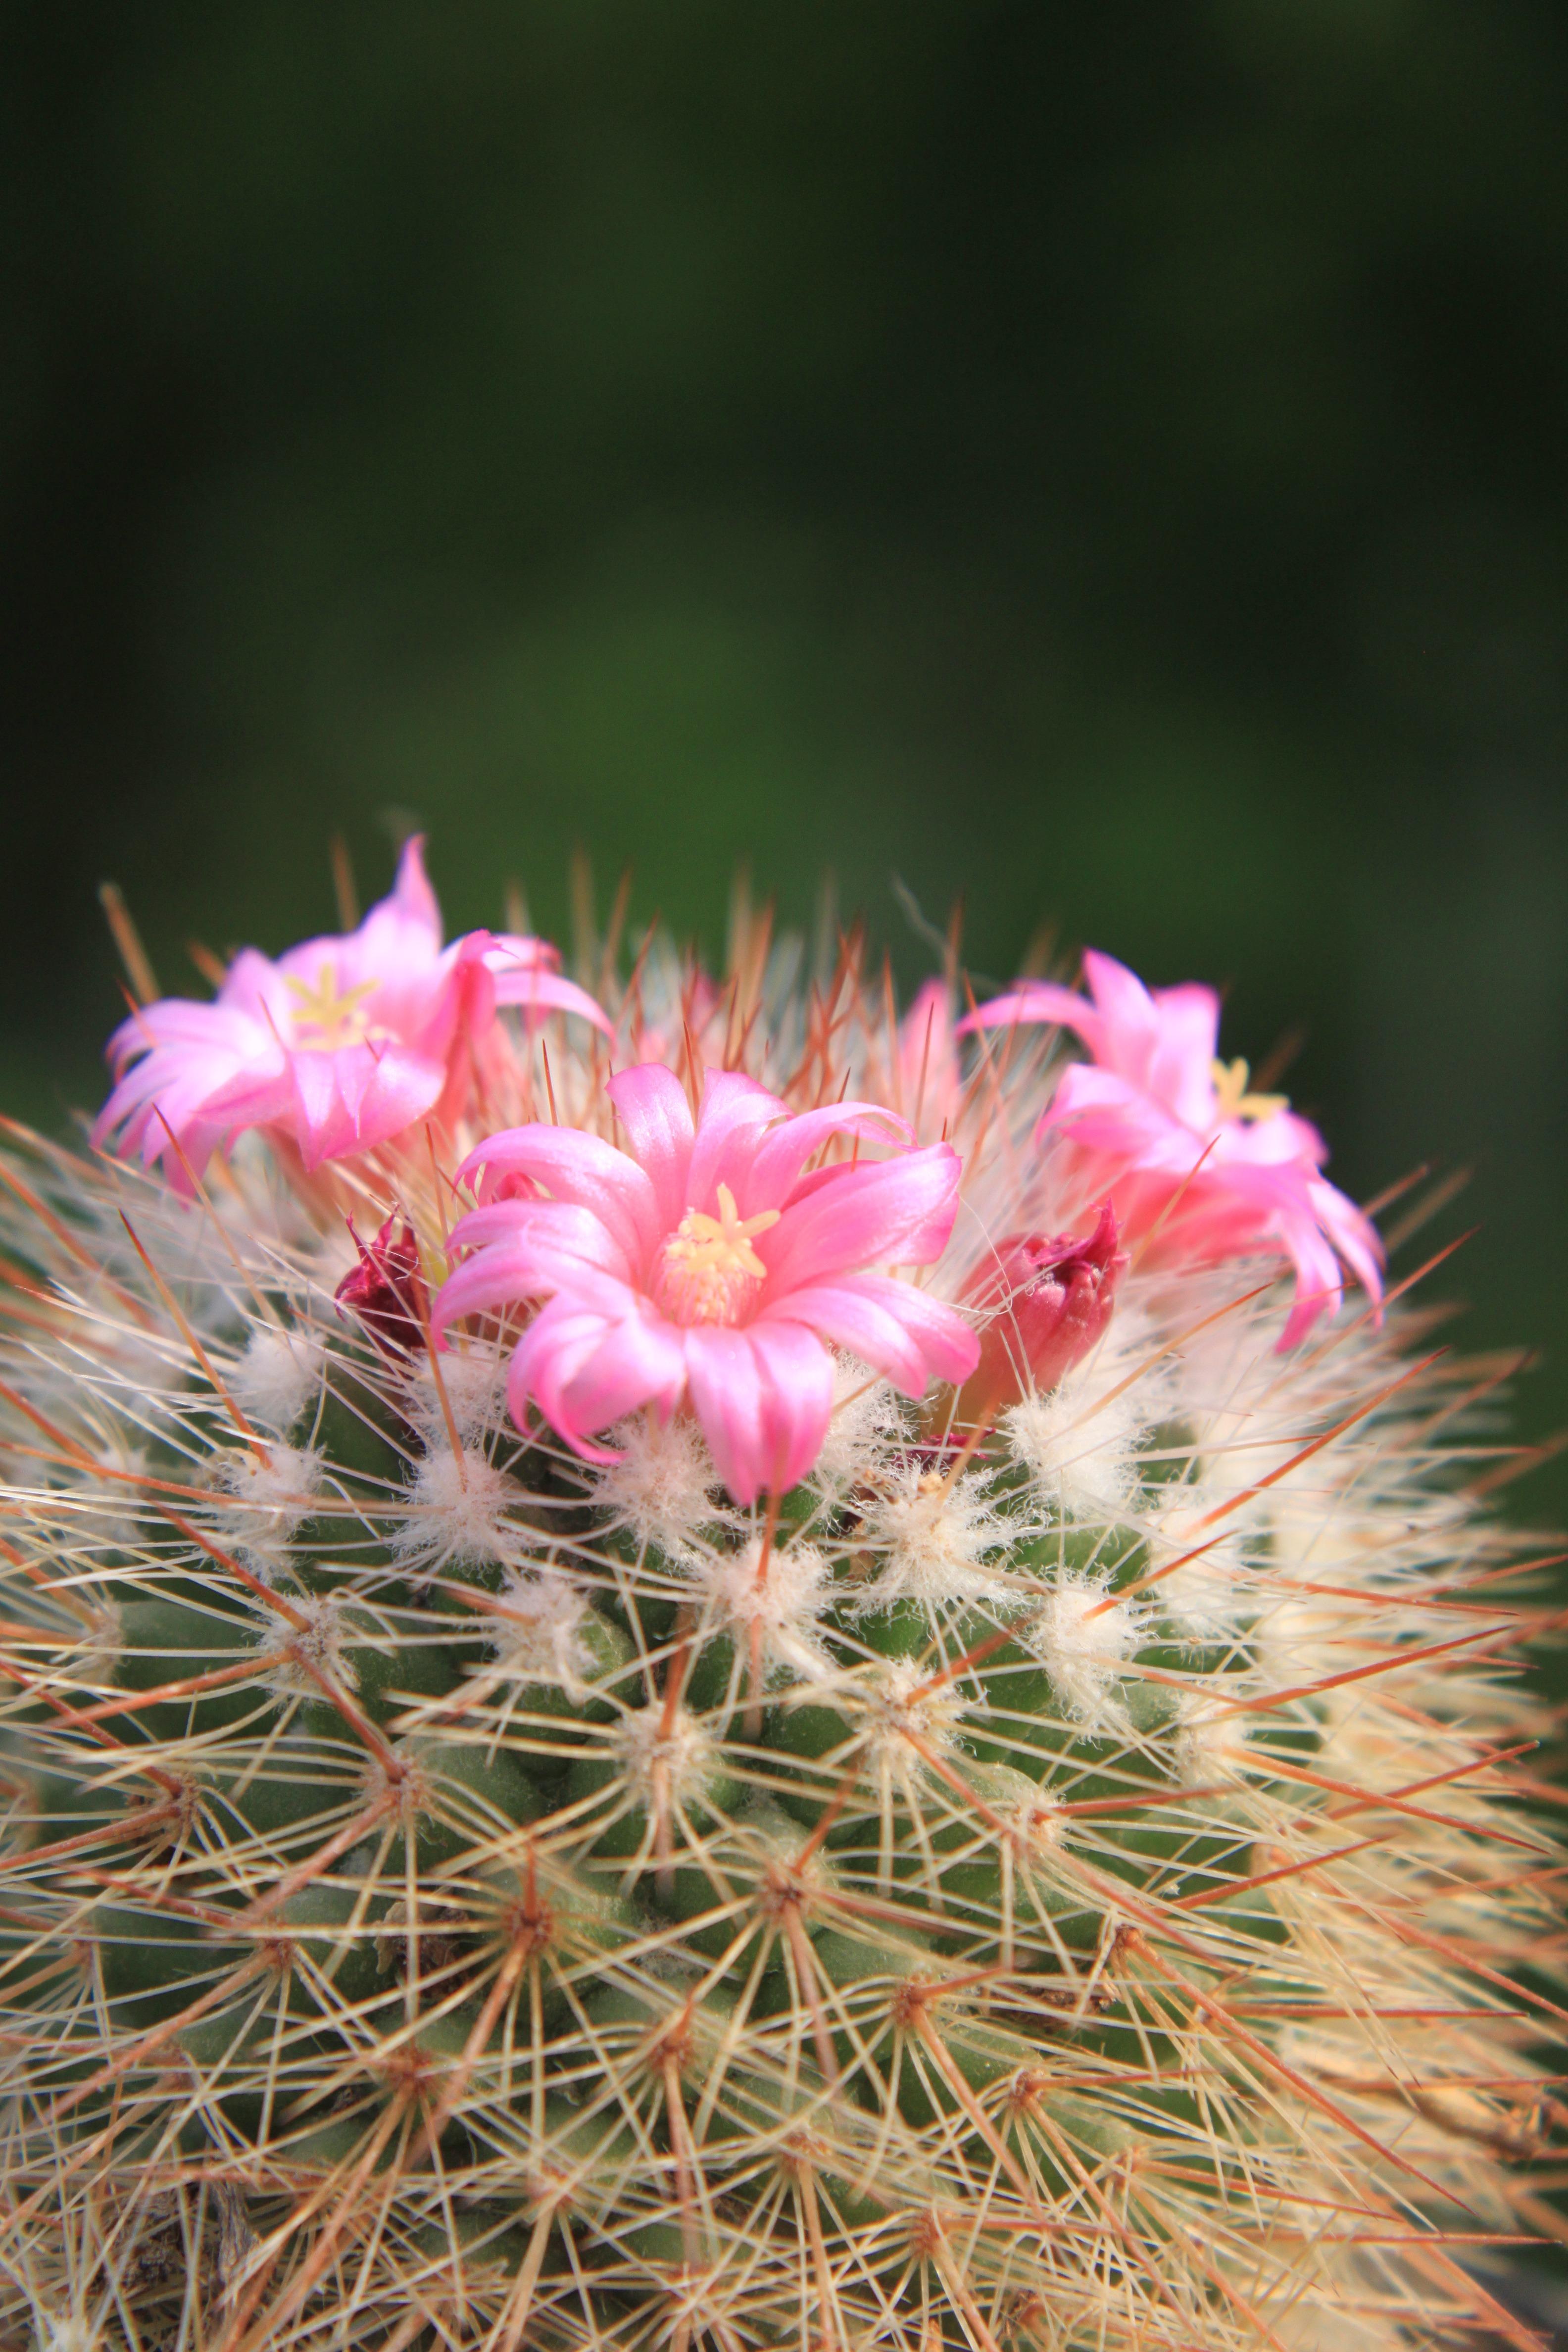 Free Images Flower Petal Small Botany Pink Cacti Flora